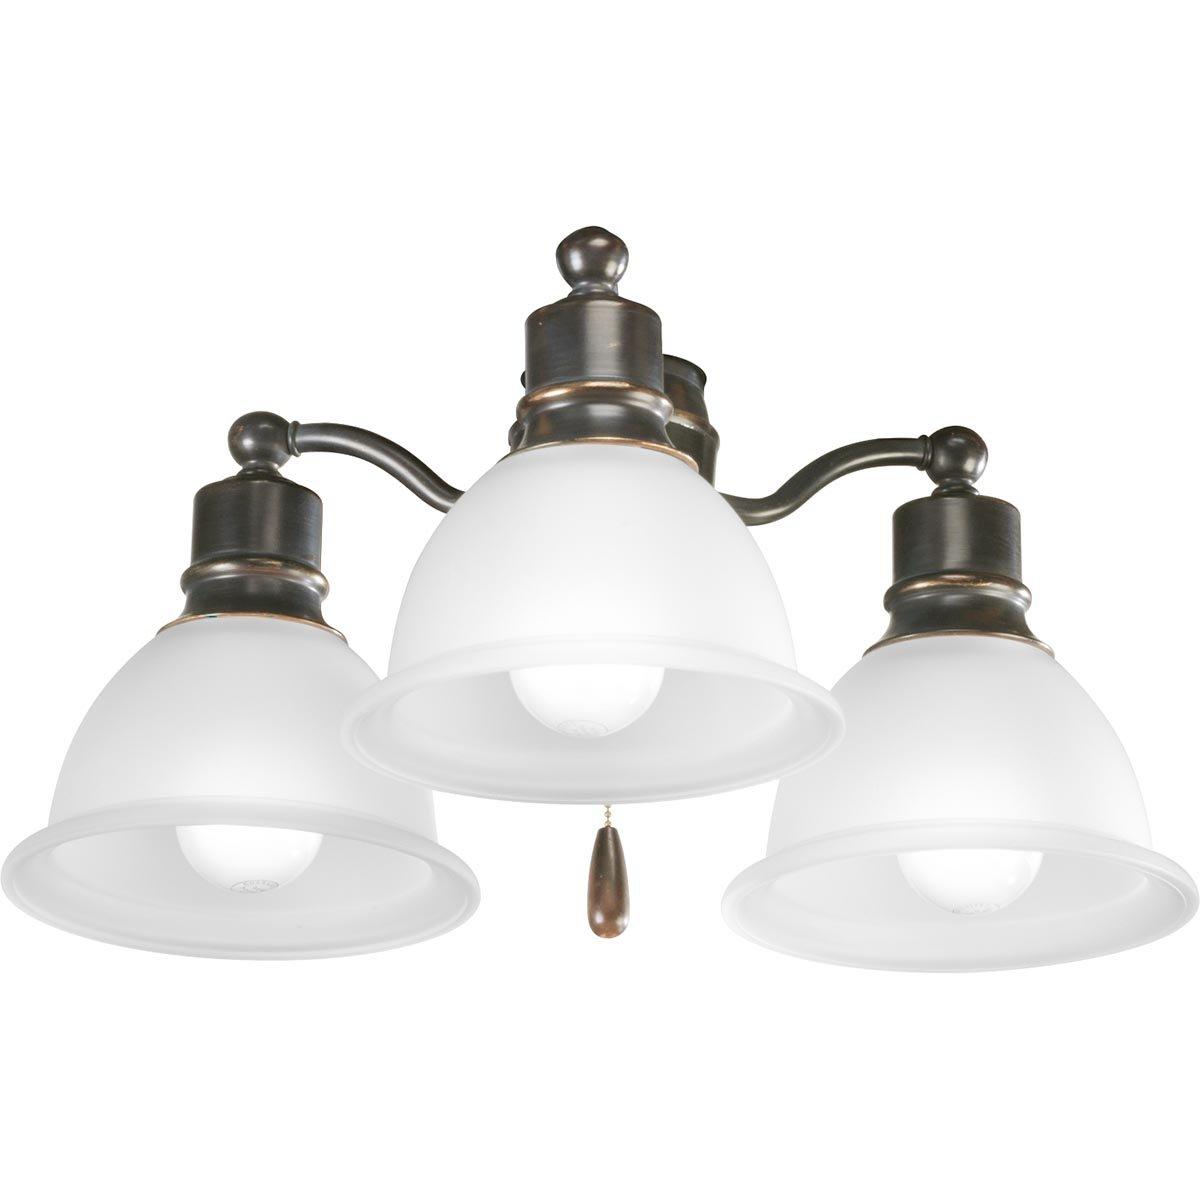 Progress Lighting P2623-20WB Fan Light Kit, Antique Bronze